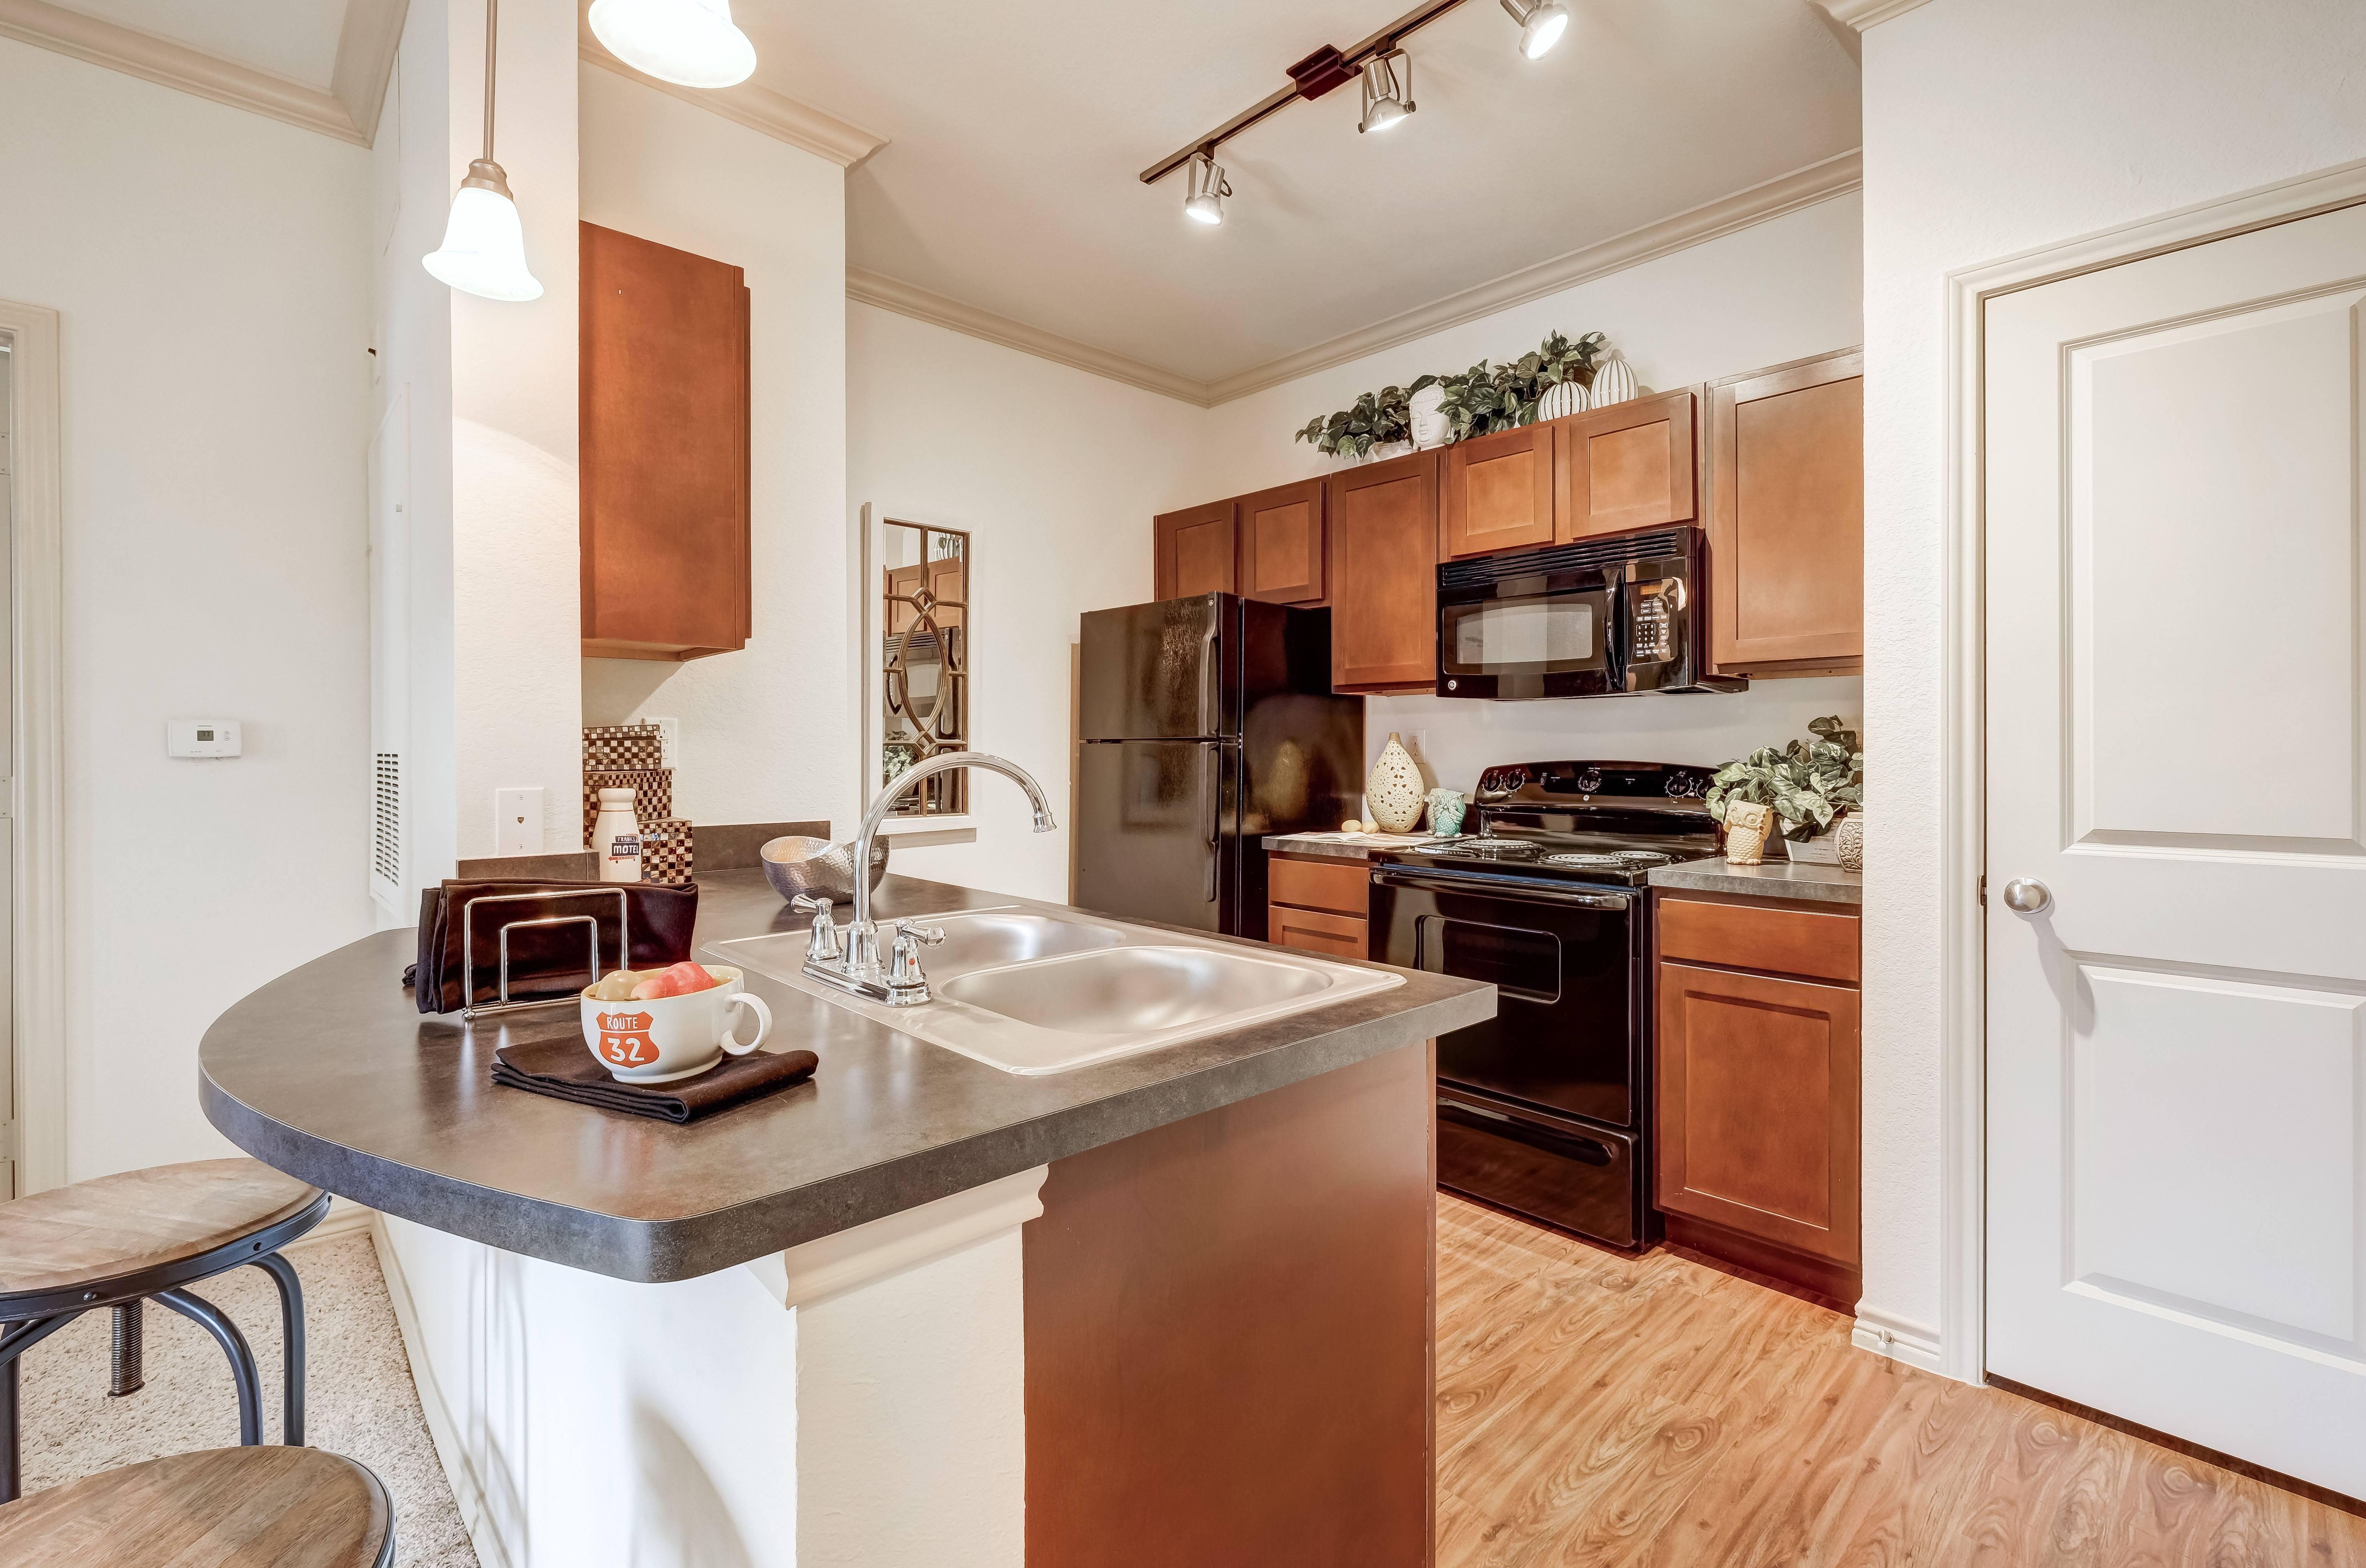 Apartments Near UTSA Sevona Westover Hills for University of Texas at San Antonio Students in San Antonio, TX